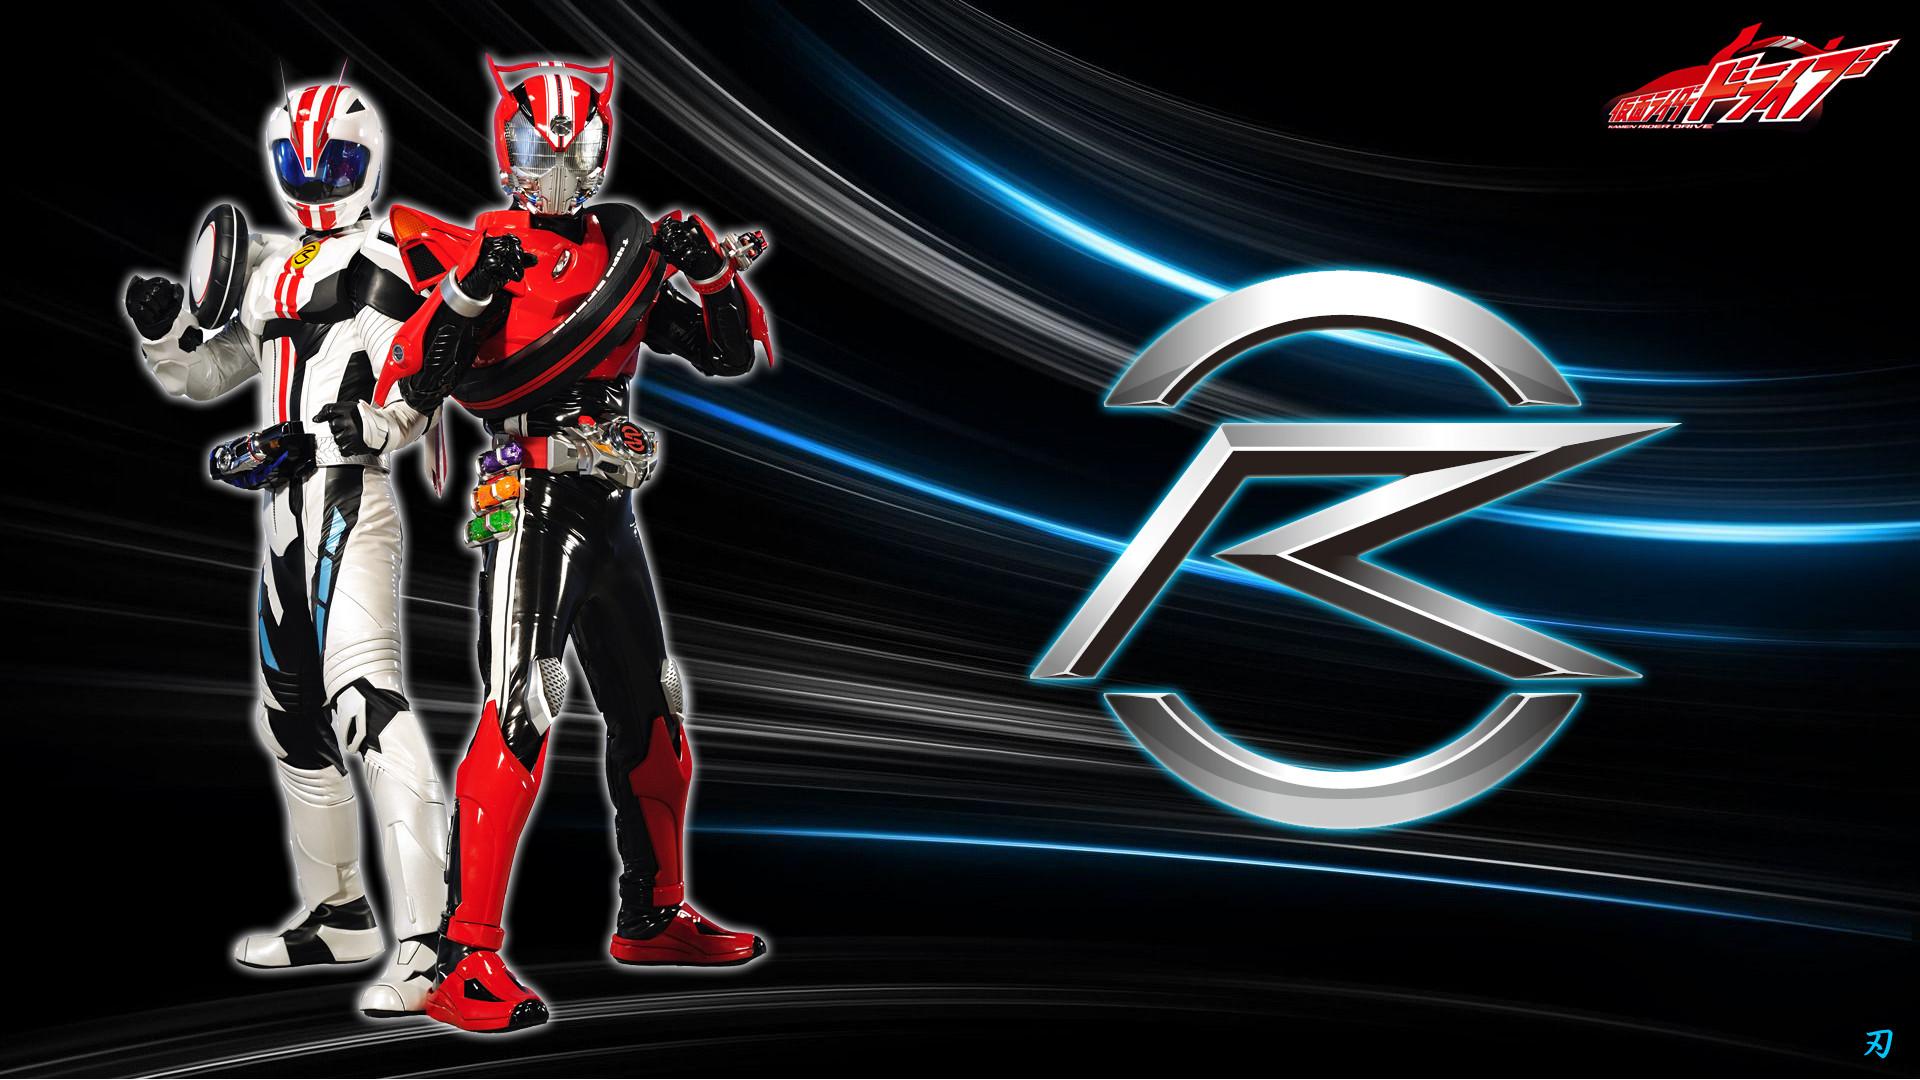 35 350273 1920x1080 Kamen Rider Drive And Mach By Yaiba1